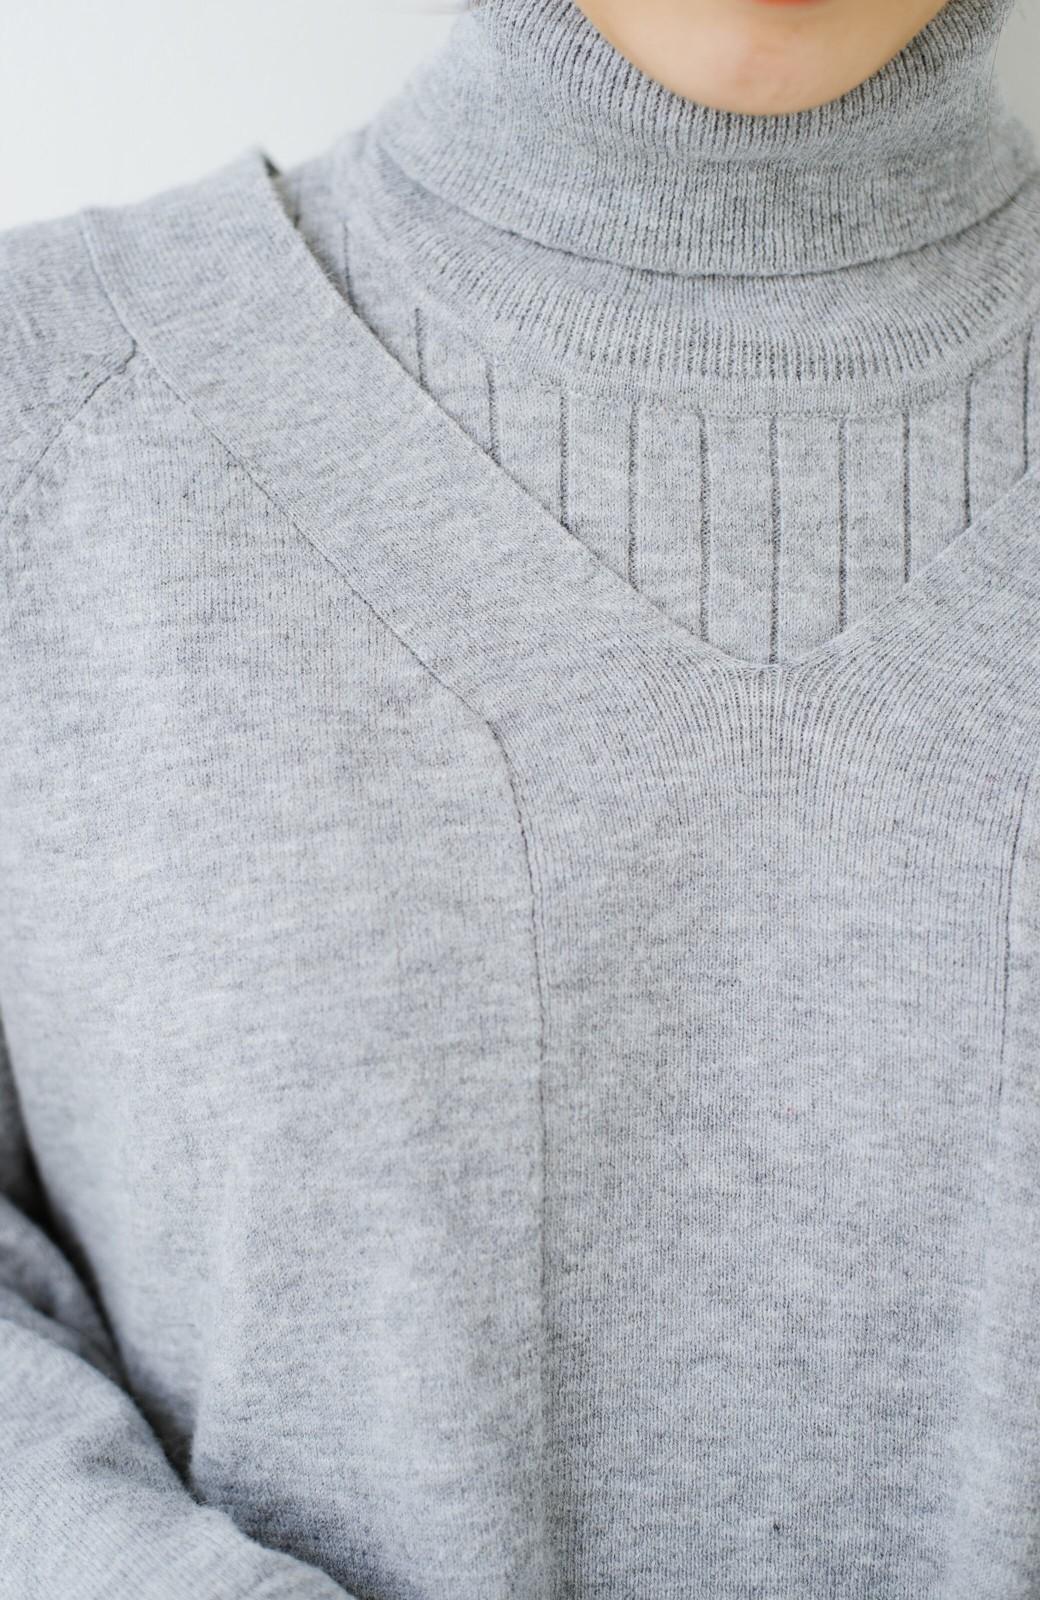 haco! セットで着るだけパッとかわいい ニットトップス&ノースリーブニットワンピースセット <グレー>の商品写真7